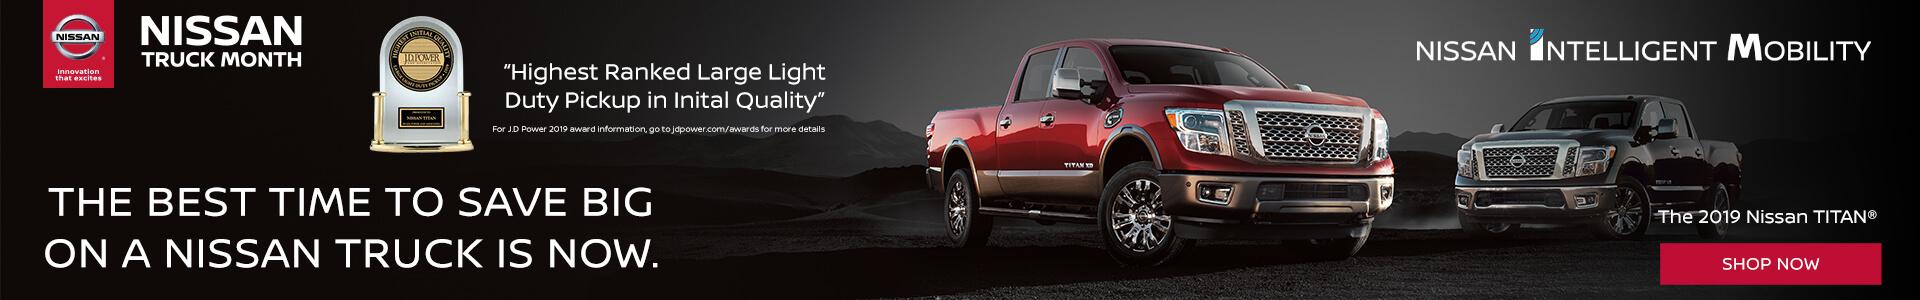 Nissan Truck Month